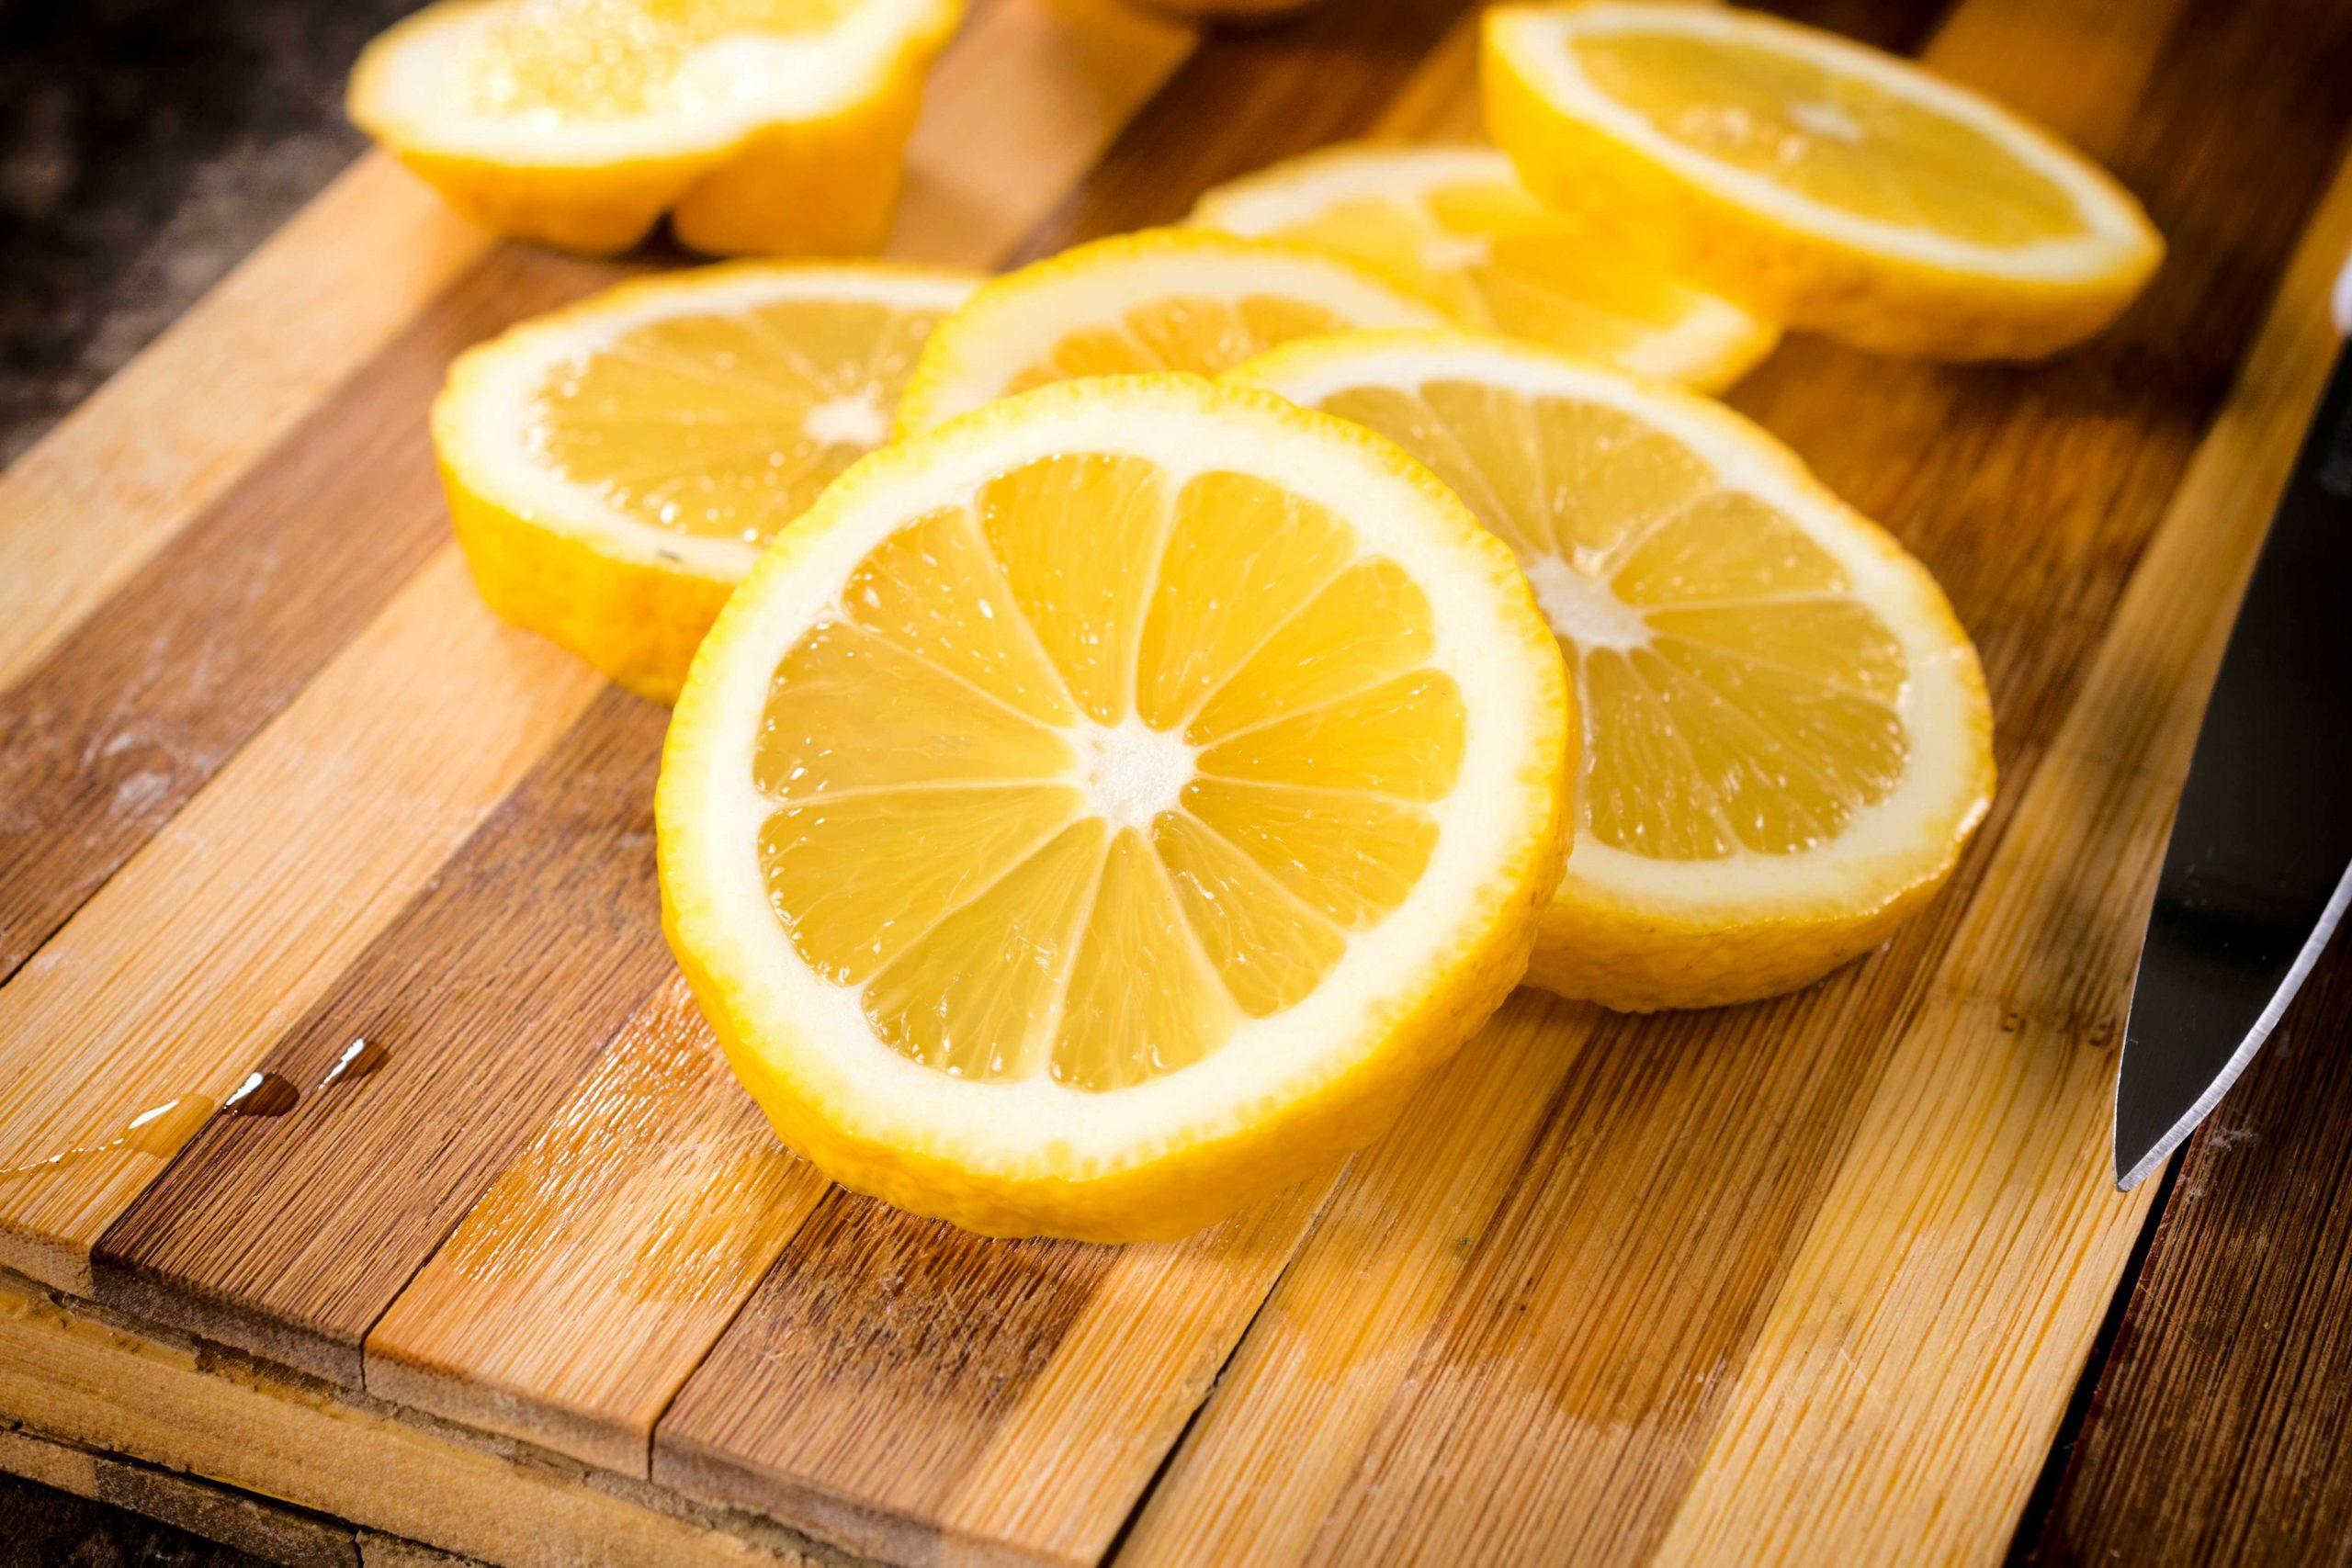 Can Lemon Juice Kill Sperm?